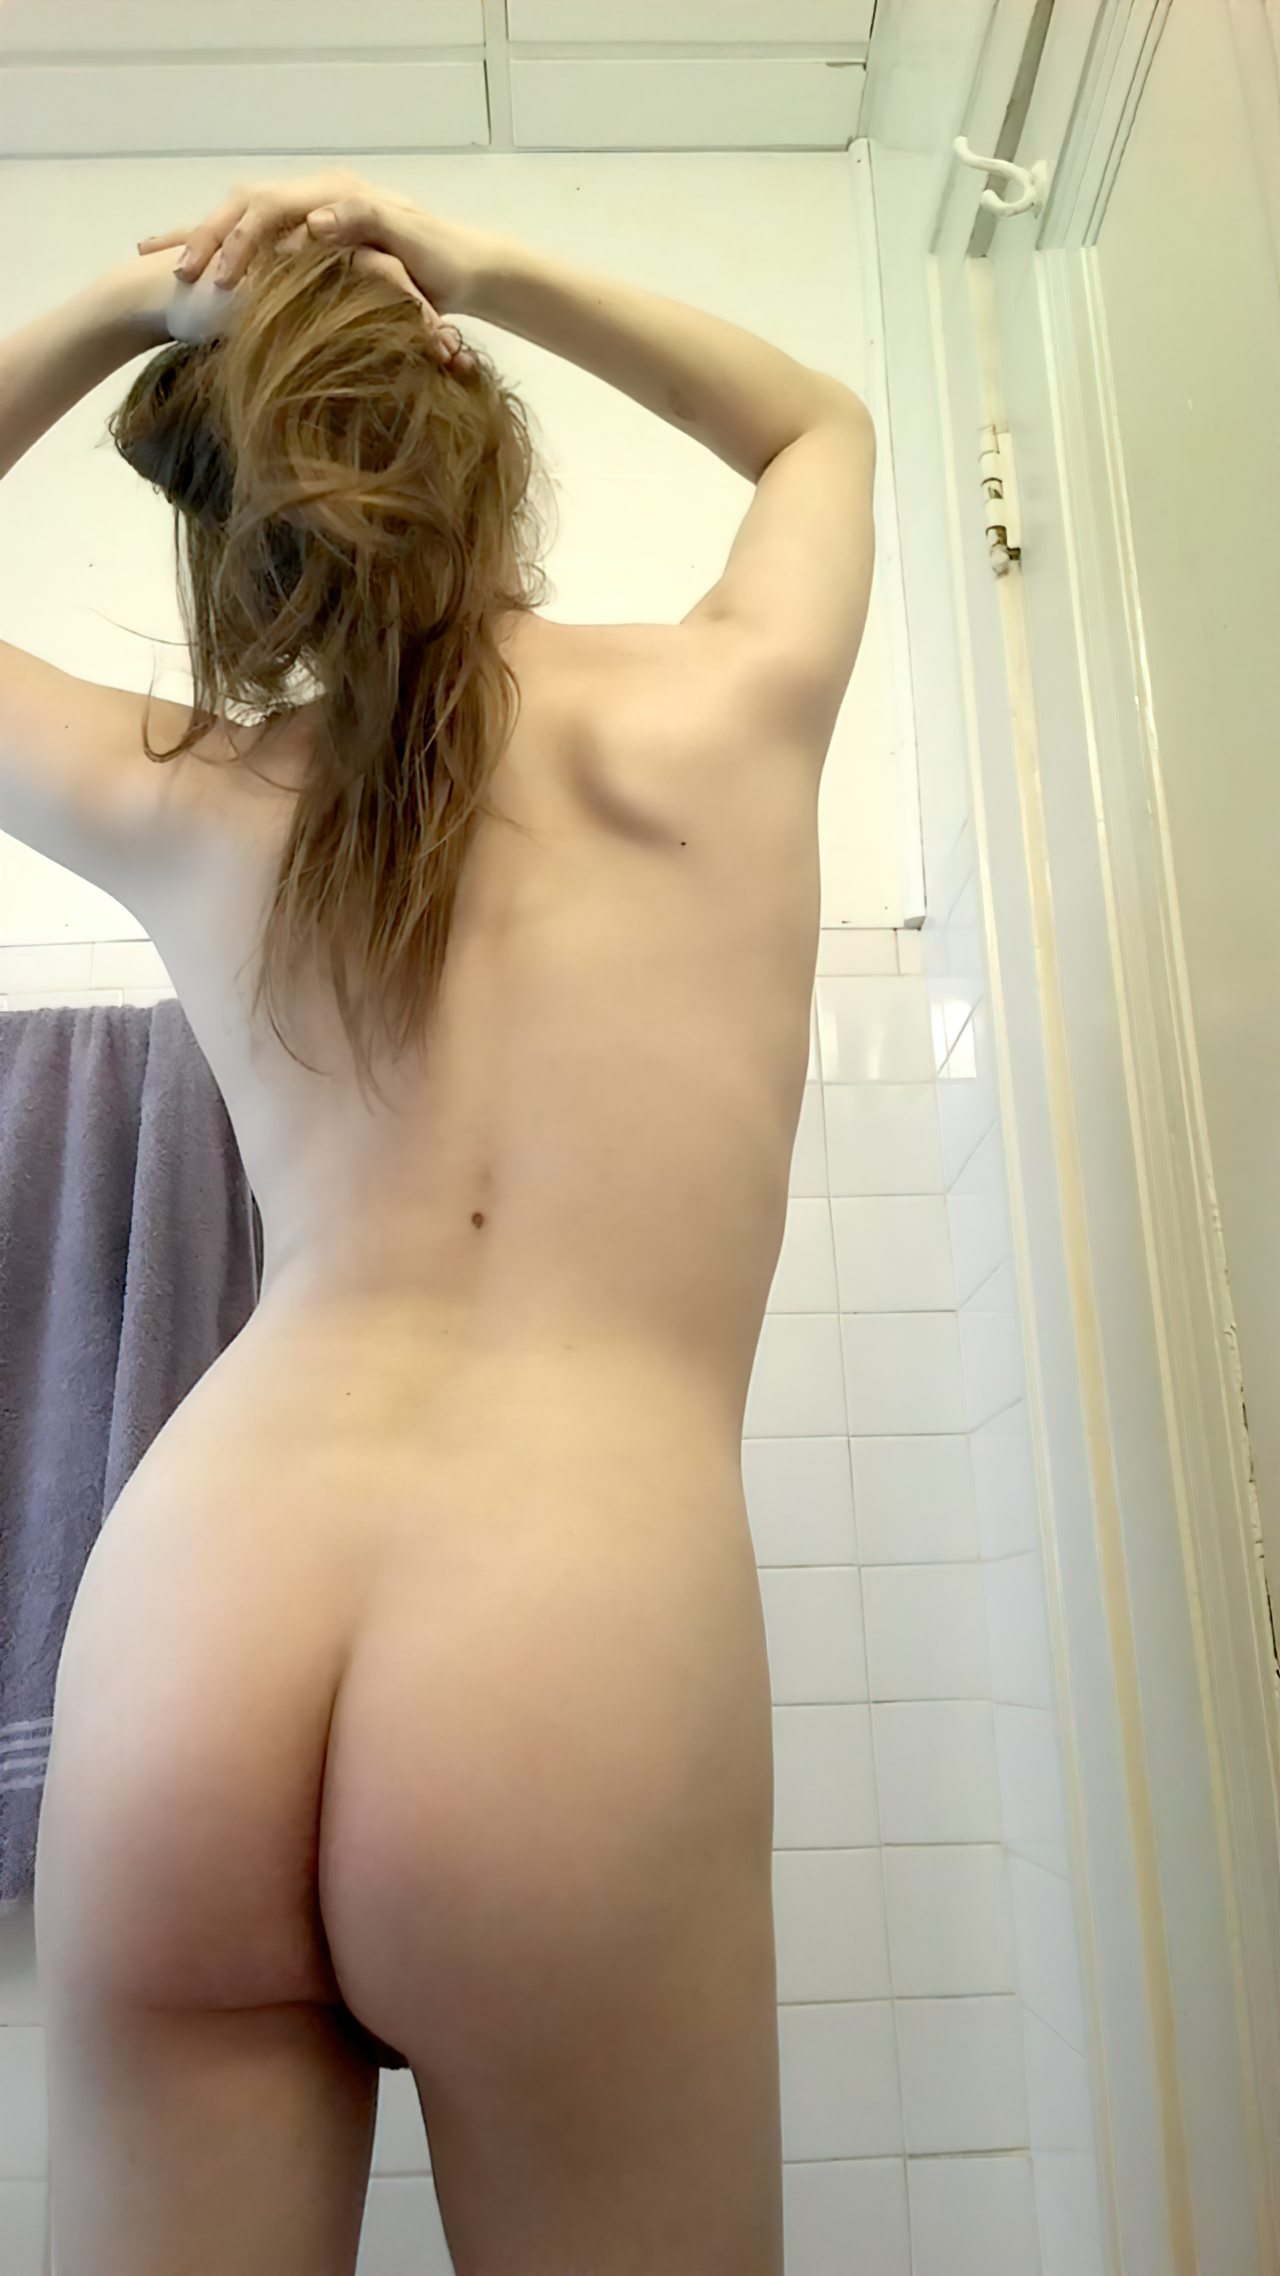 amadoras videos travestis fotos